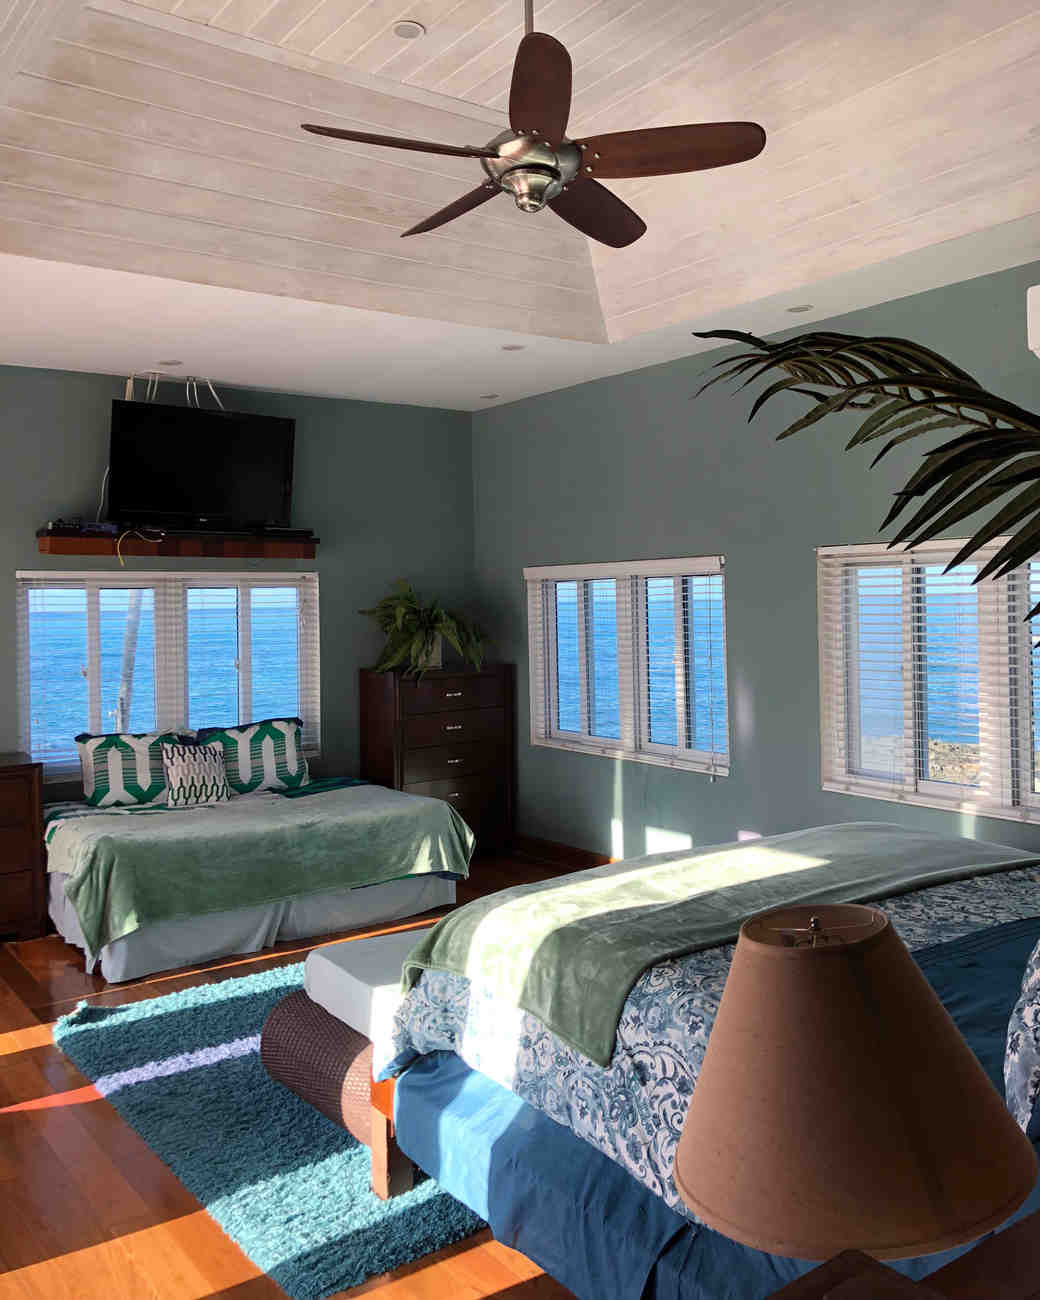 airbnb-wedding-venues-nassau-bahamas-1218_vert.jpg